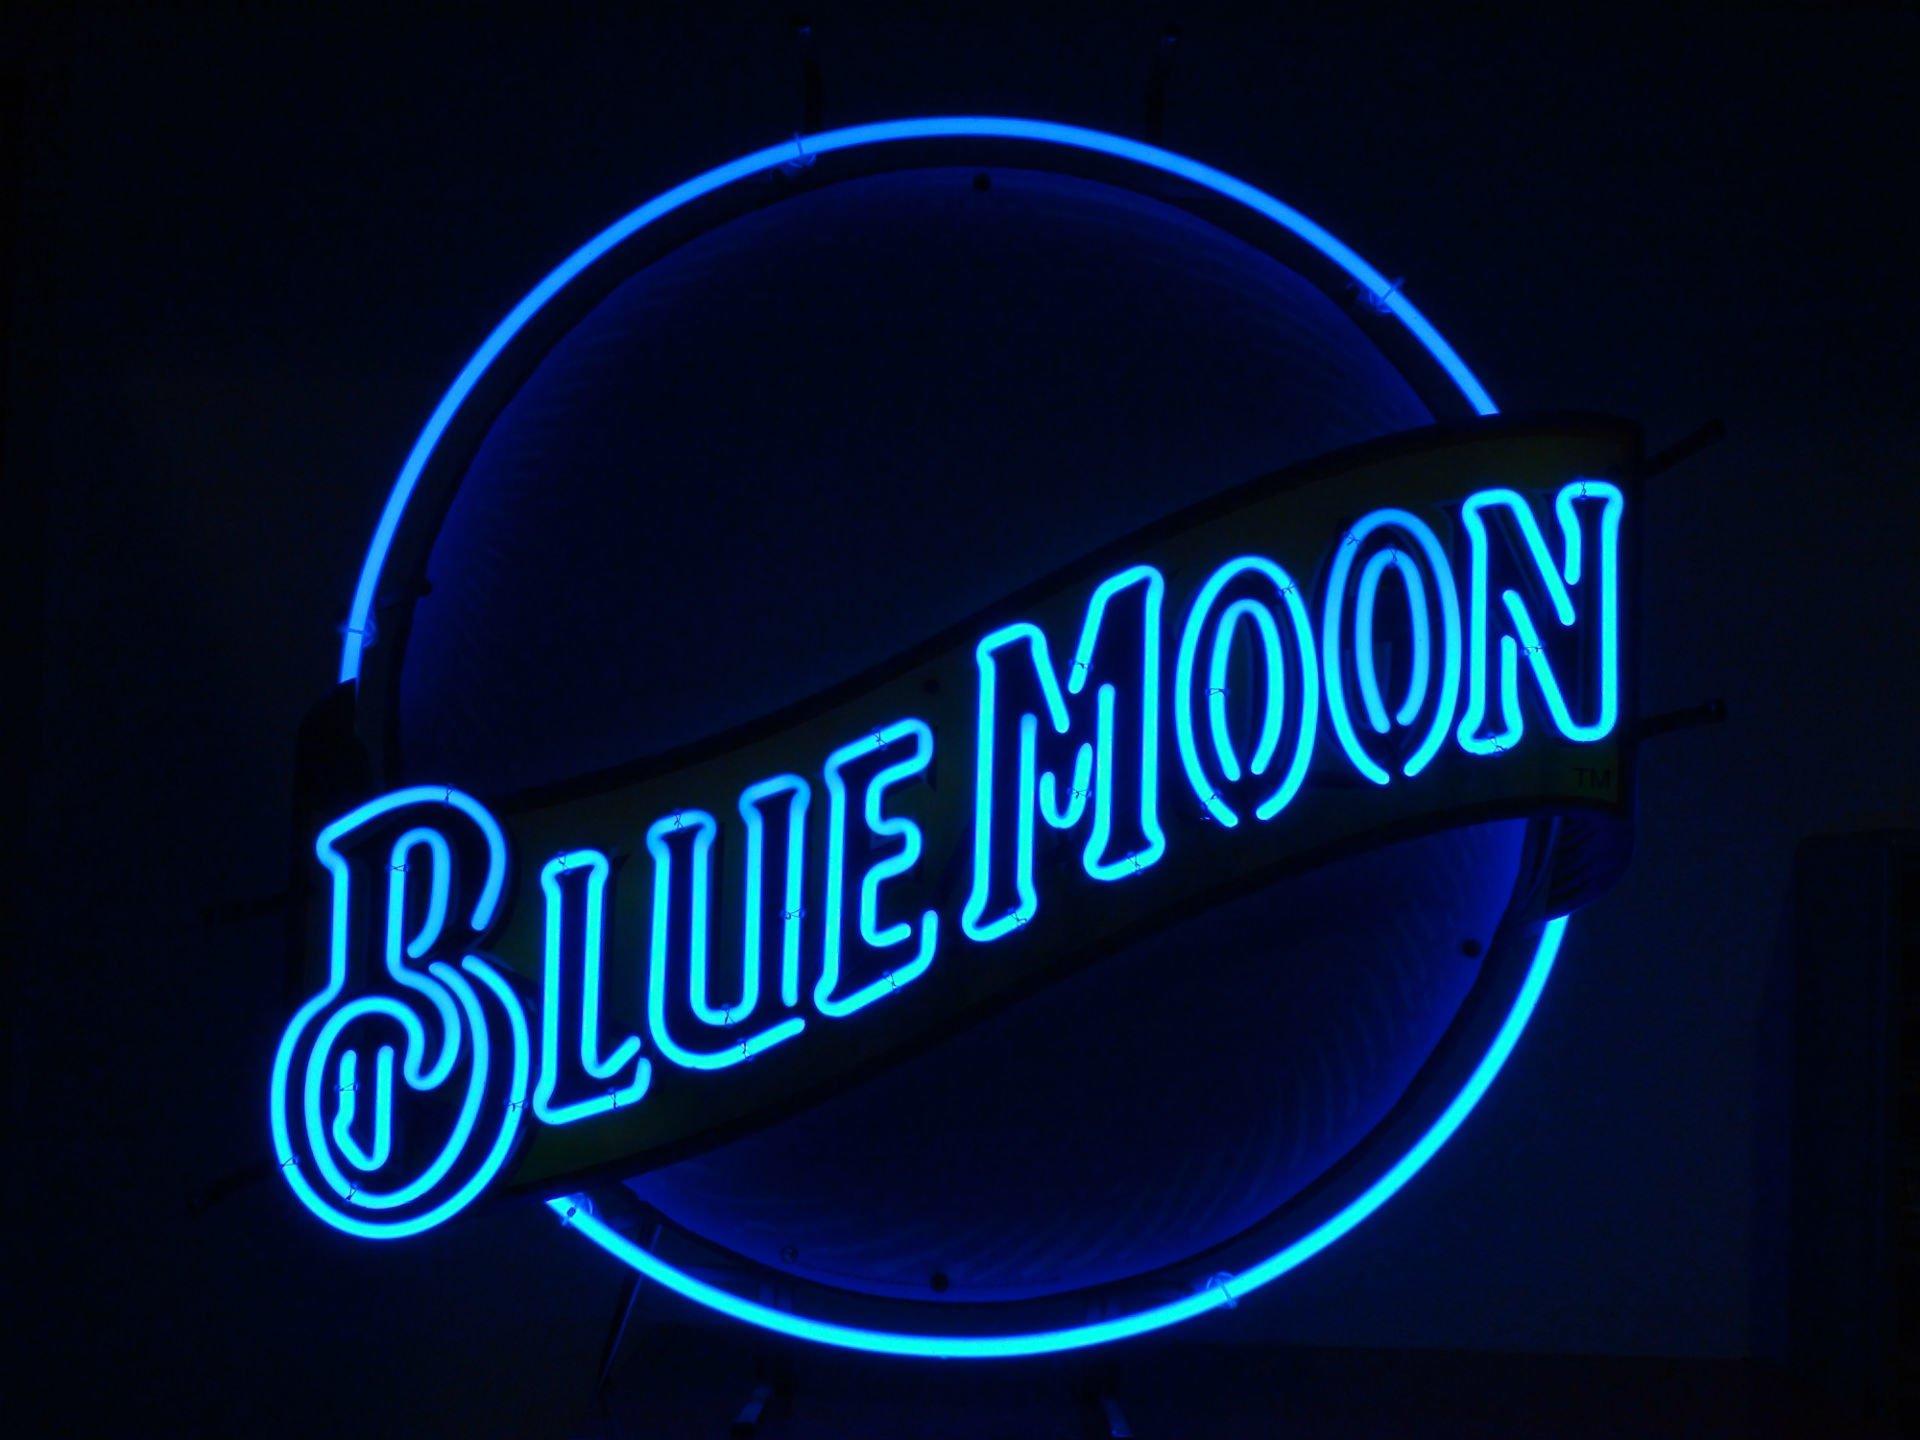 blue moon neon sign wallpaper 66621